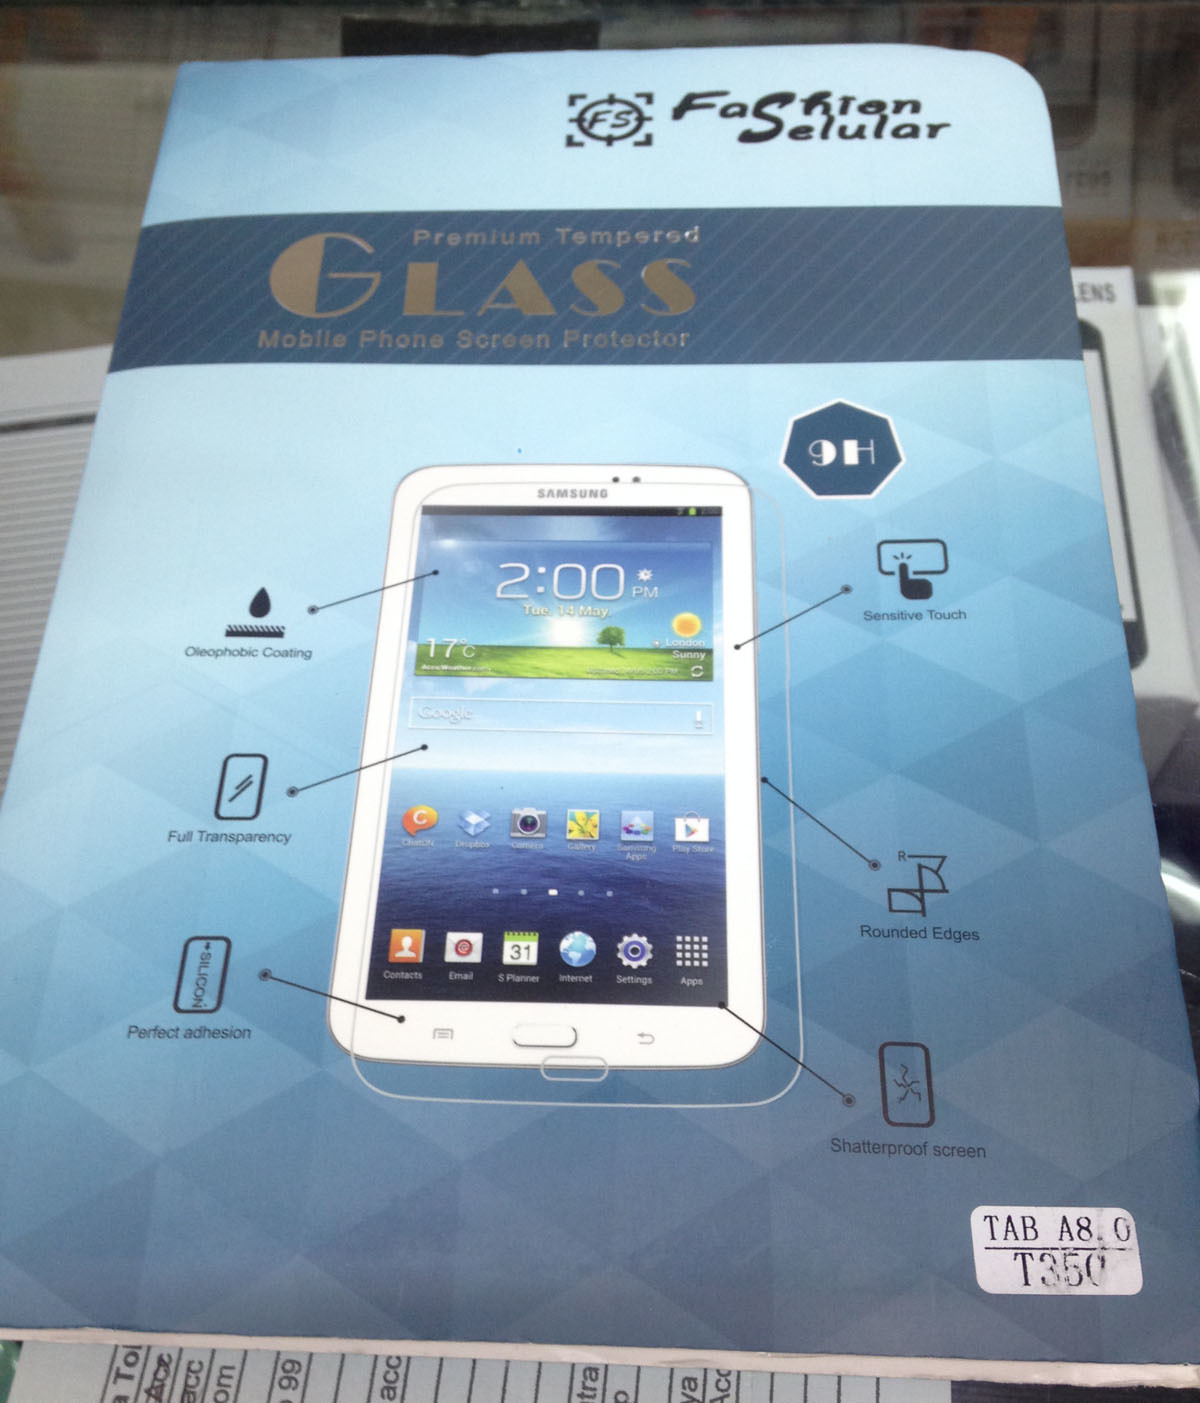 Jual Anti Gores Kaca Tempered Glass Samsung Tab A 8 Inch Standar Laptop Screen Protector Hp Pelindung Layar T350 Distributor Aksesoris Tokopedia